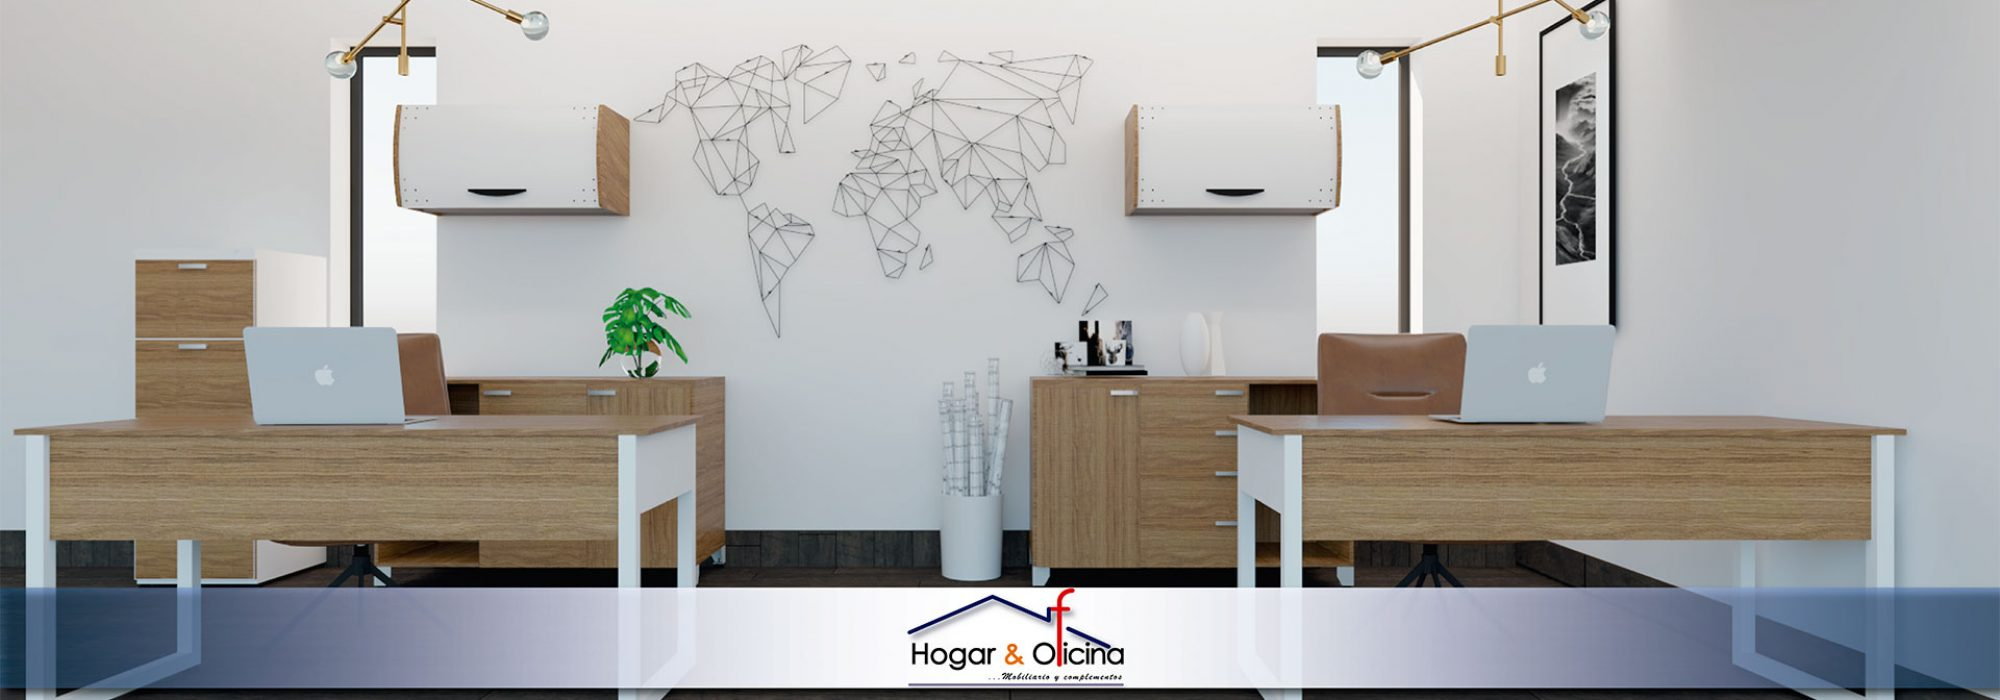 Instruequipos_hogar-oficina